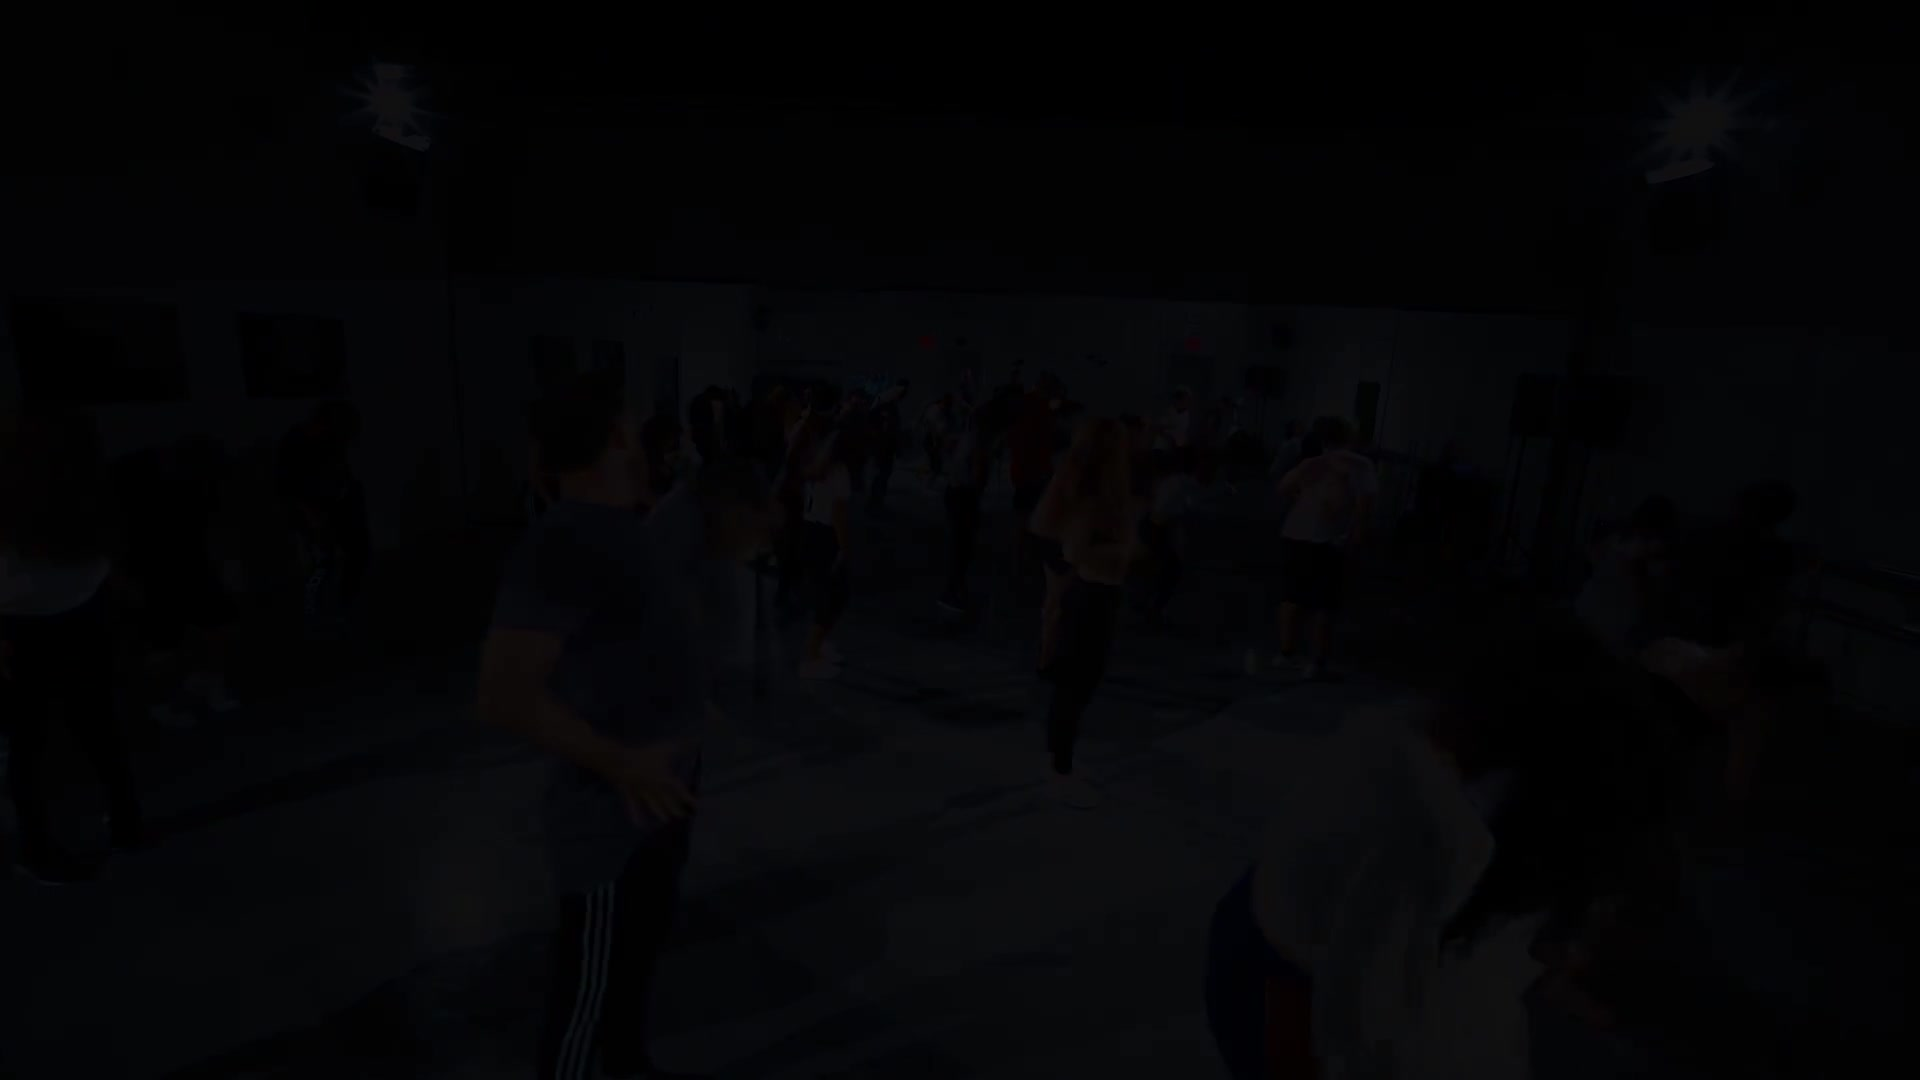 Camren Bicondova, dance, dance video, dance videos, dancer, magcon, new york, nyc, trending, viral, youtube, CamrenBicondova GIFs